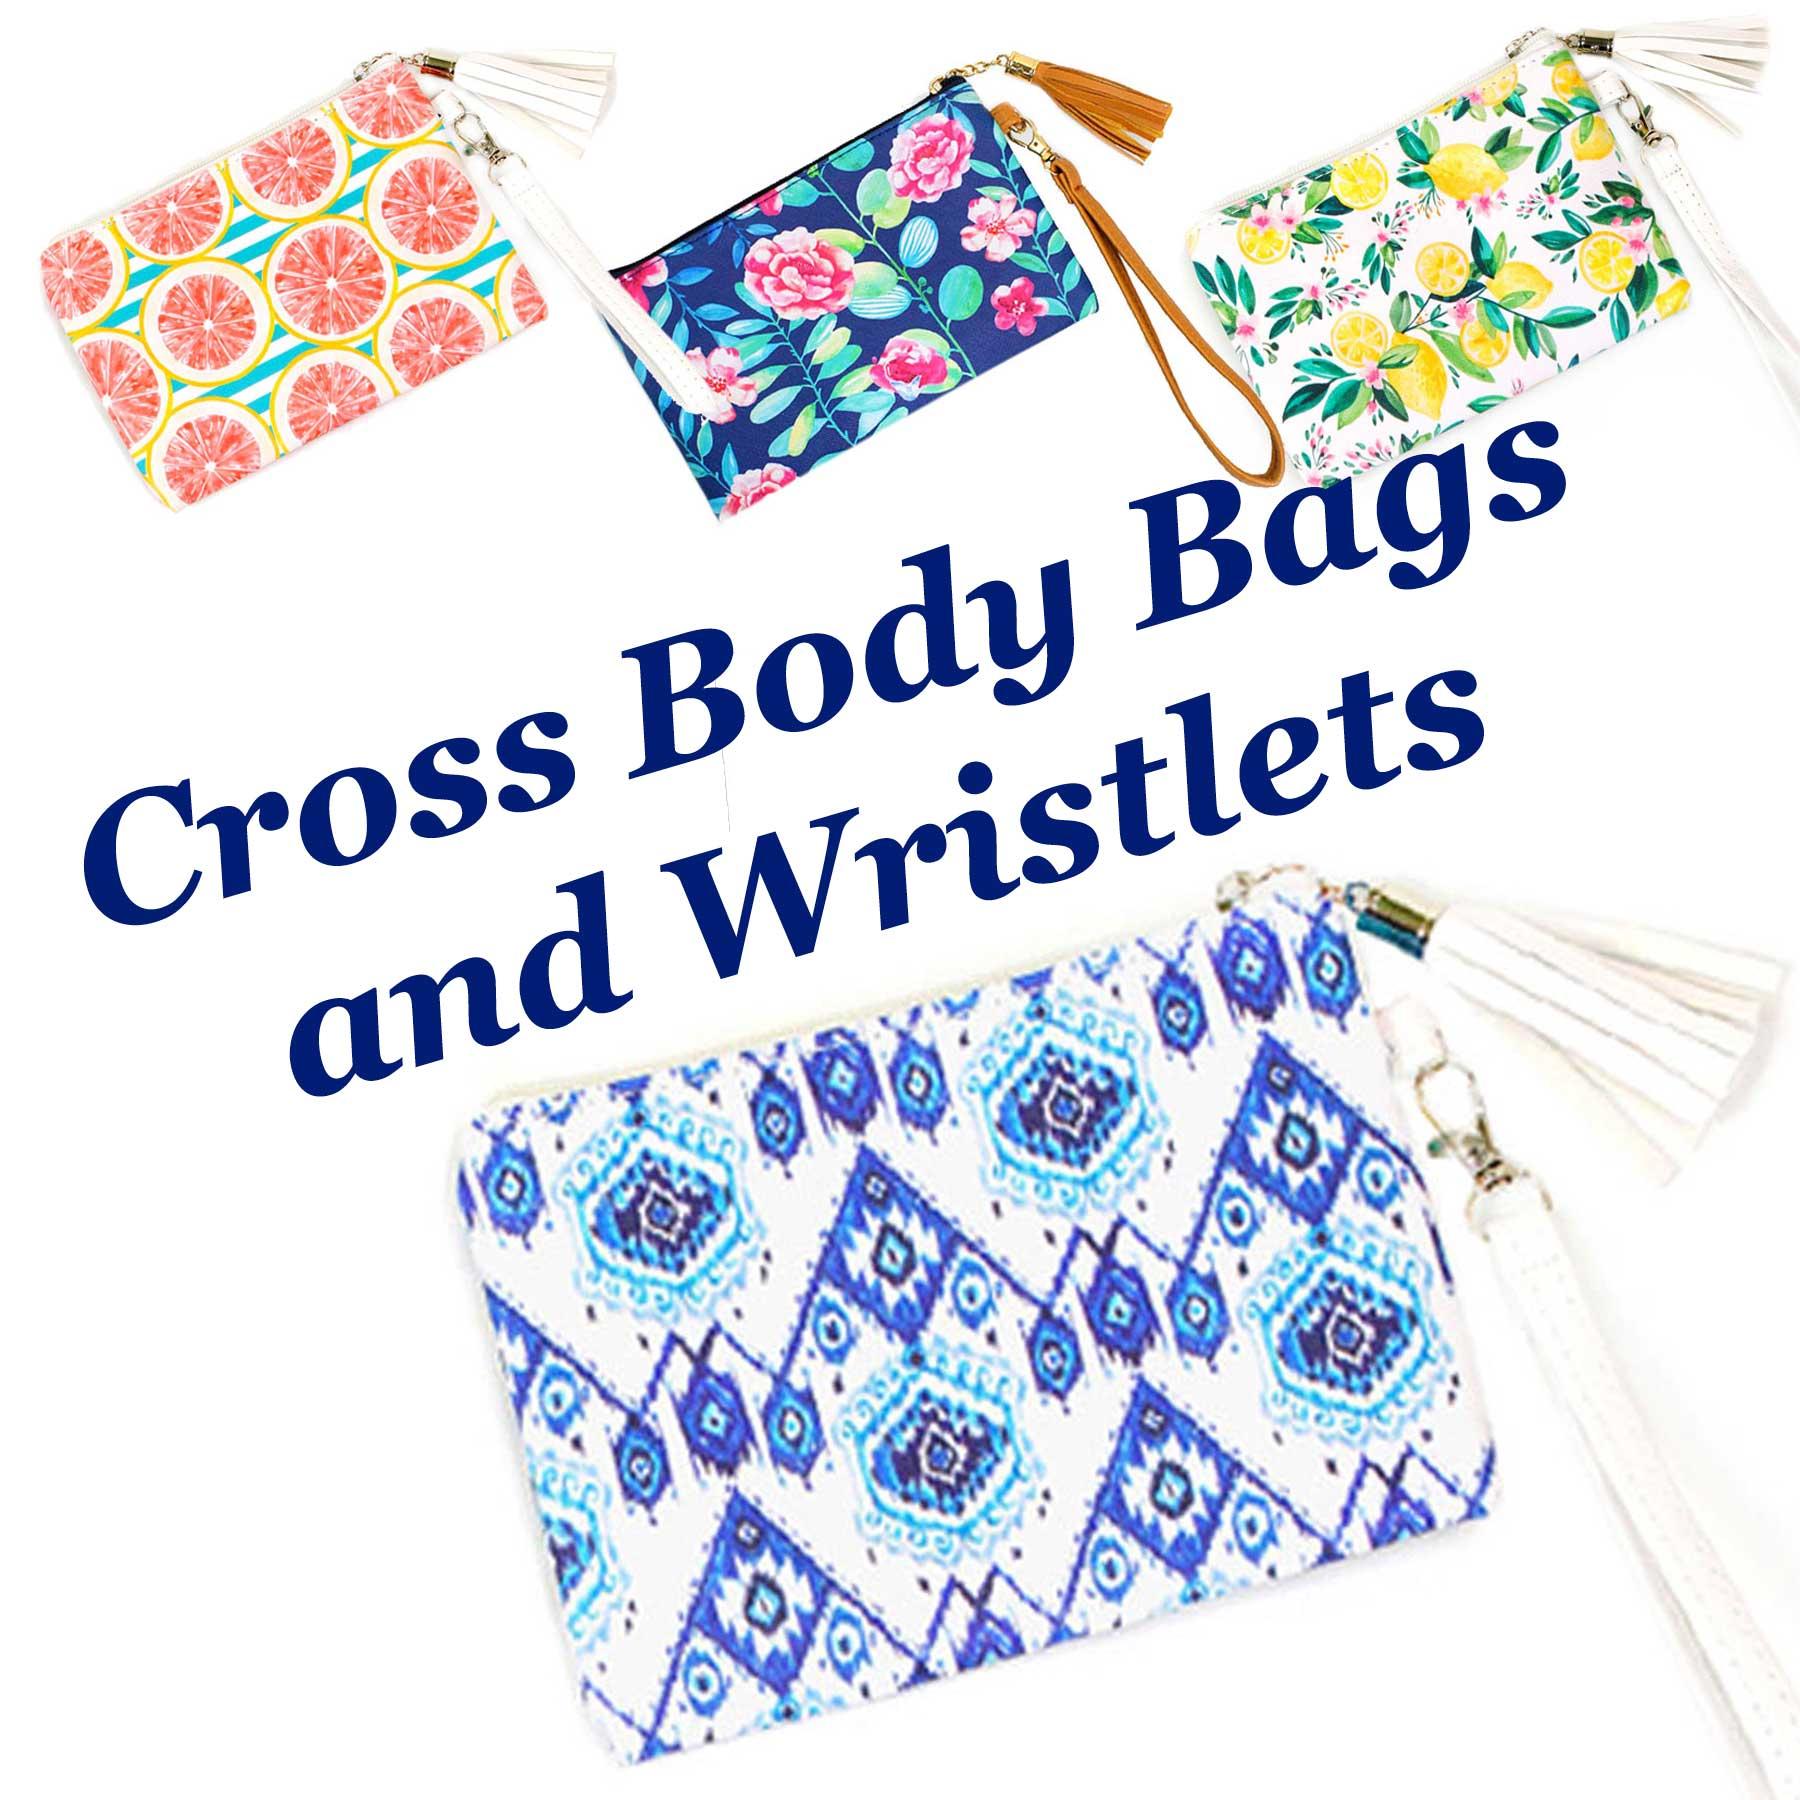 Crossbody Bags & Matching Wristlets